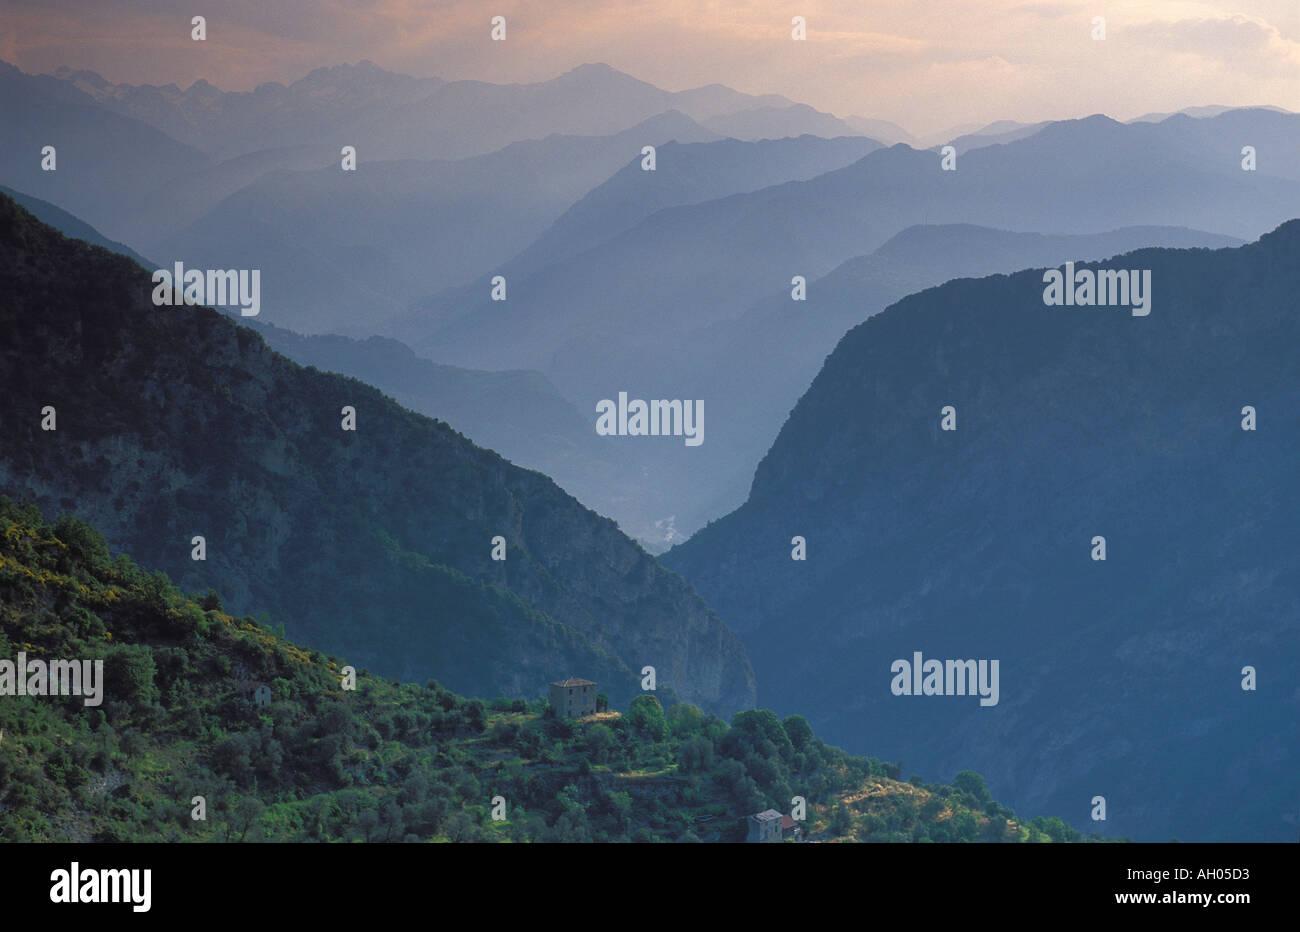 Vallee de Vesubie, Alpes Maritimes, Provence, France - Stock Image